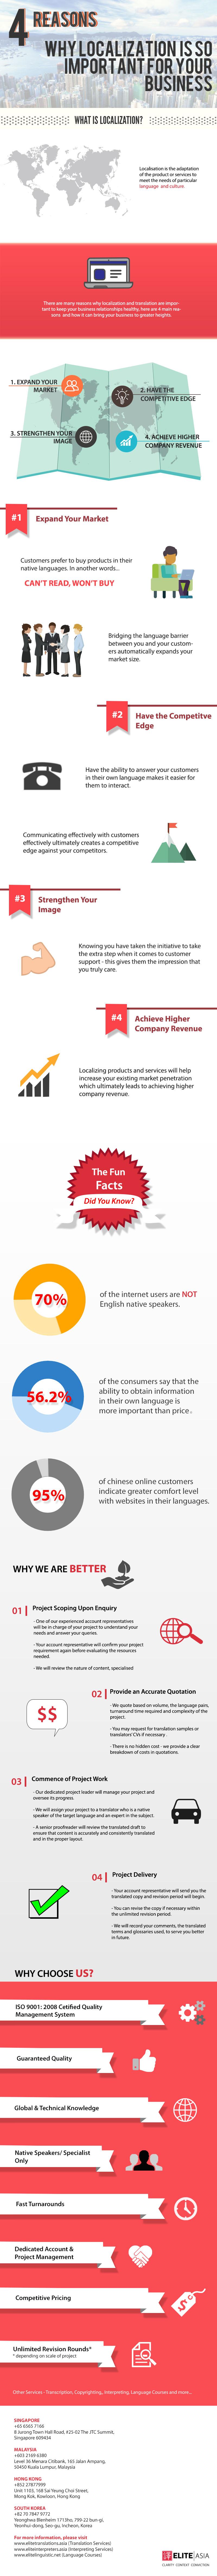 localisation infographic